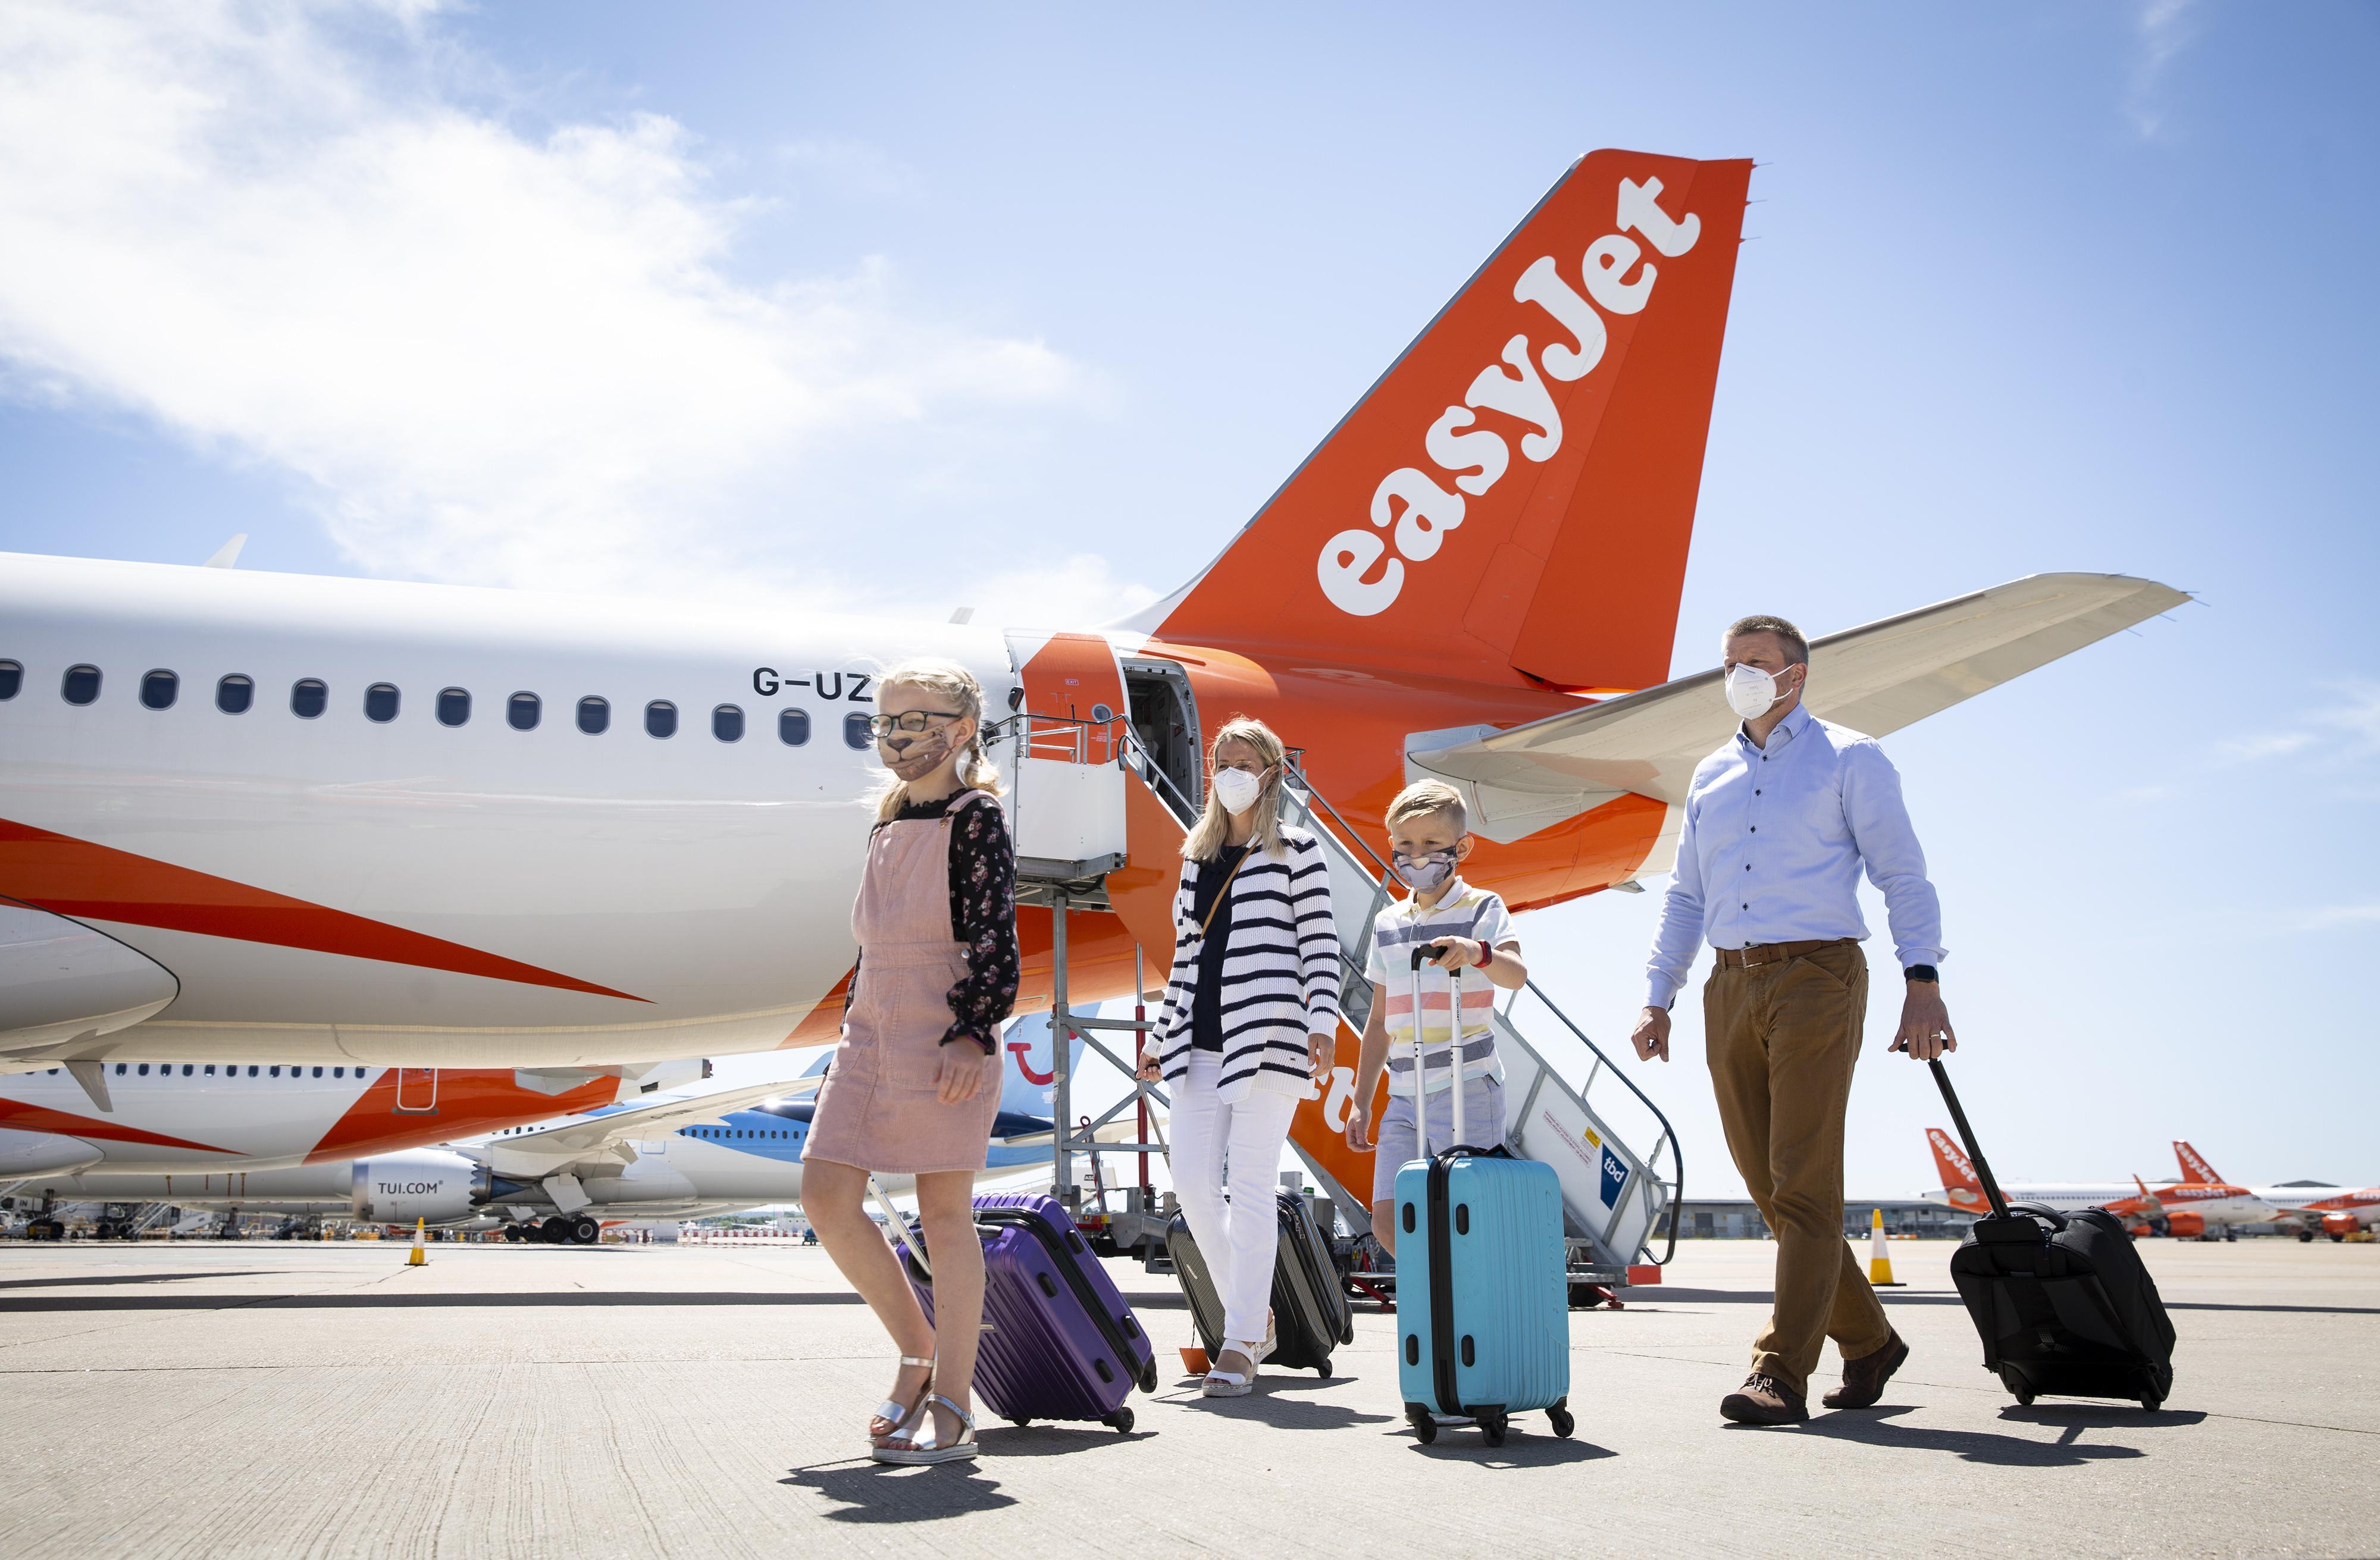 easyjet flights - photo #37